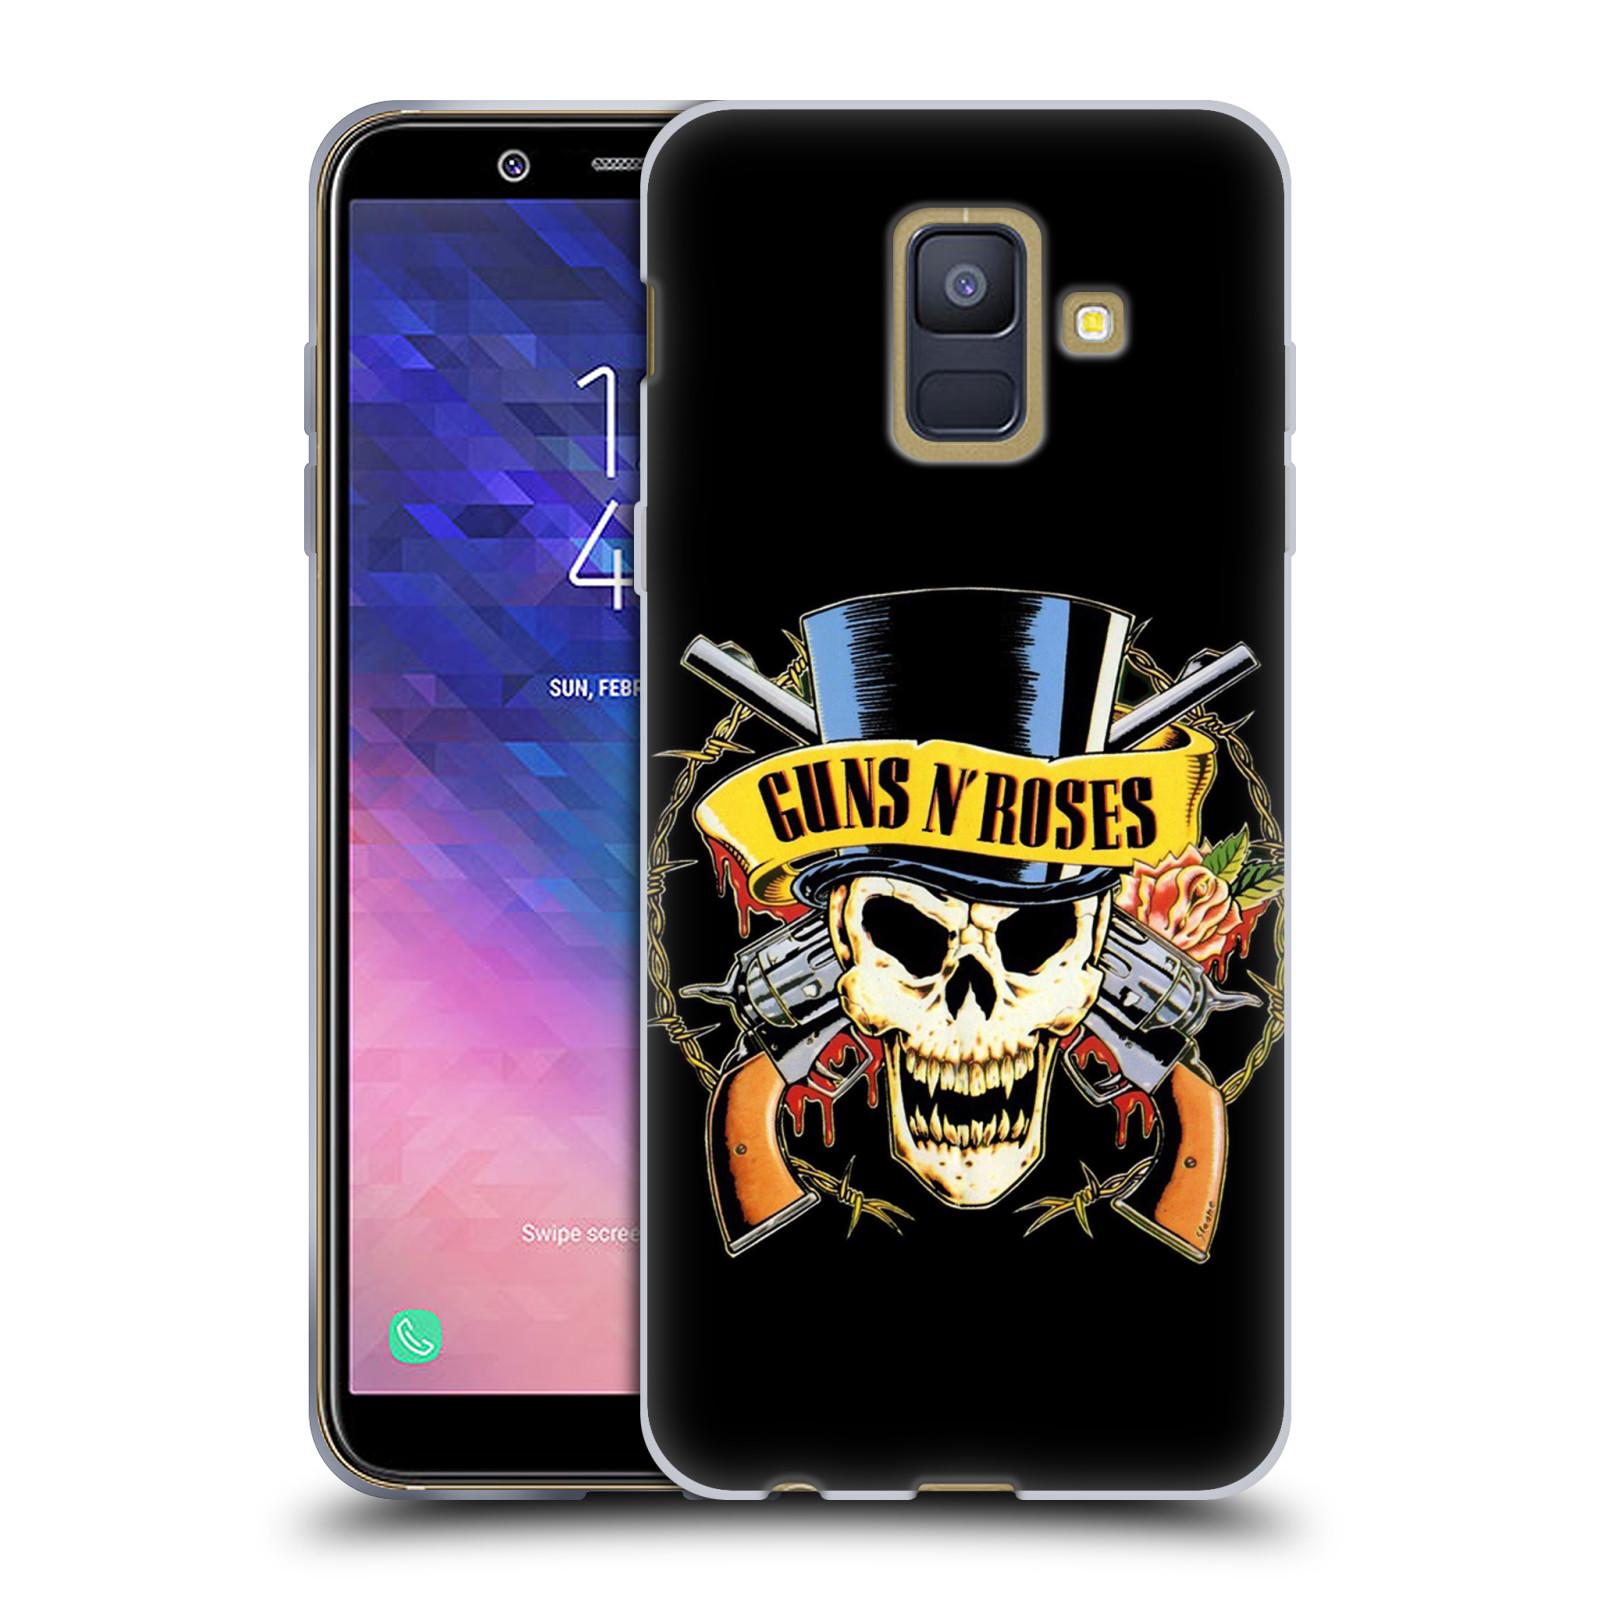 Silikonové pouzdro na mobil Samsung Galaxy A6 (2018) - Head Case - Guns N' Roses - Lebka